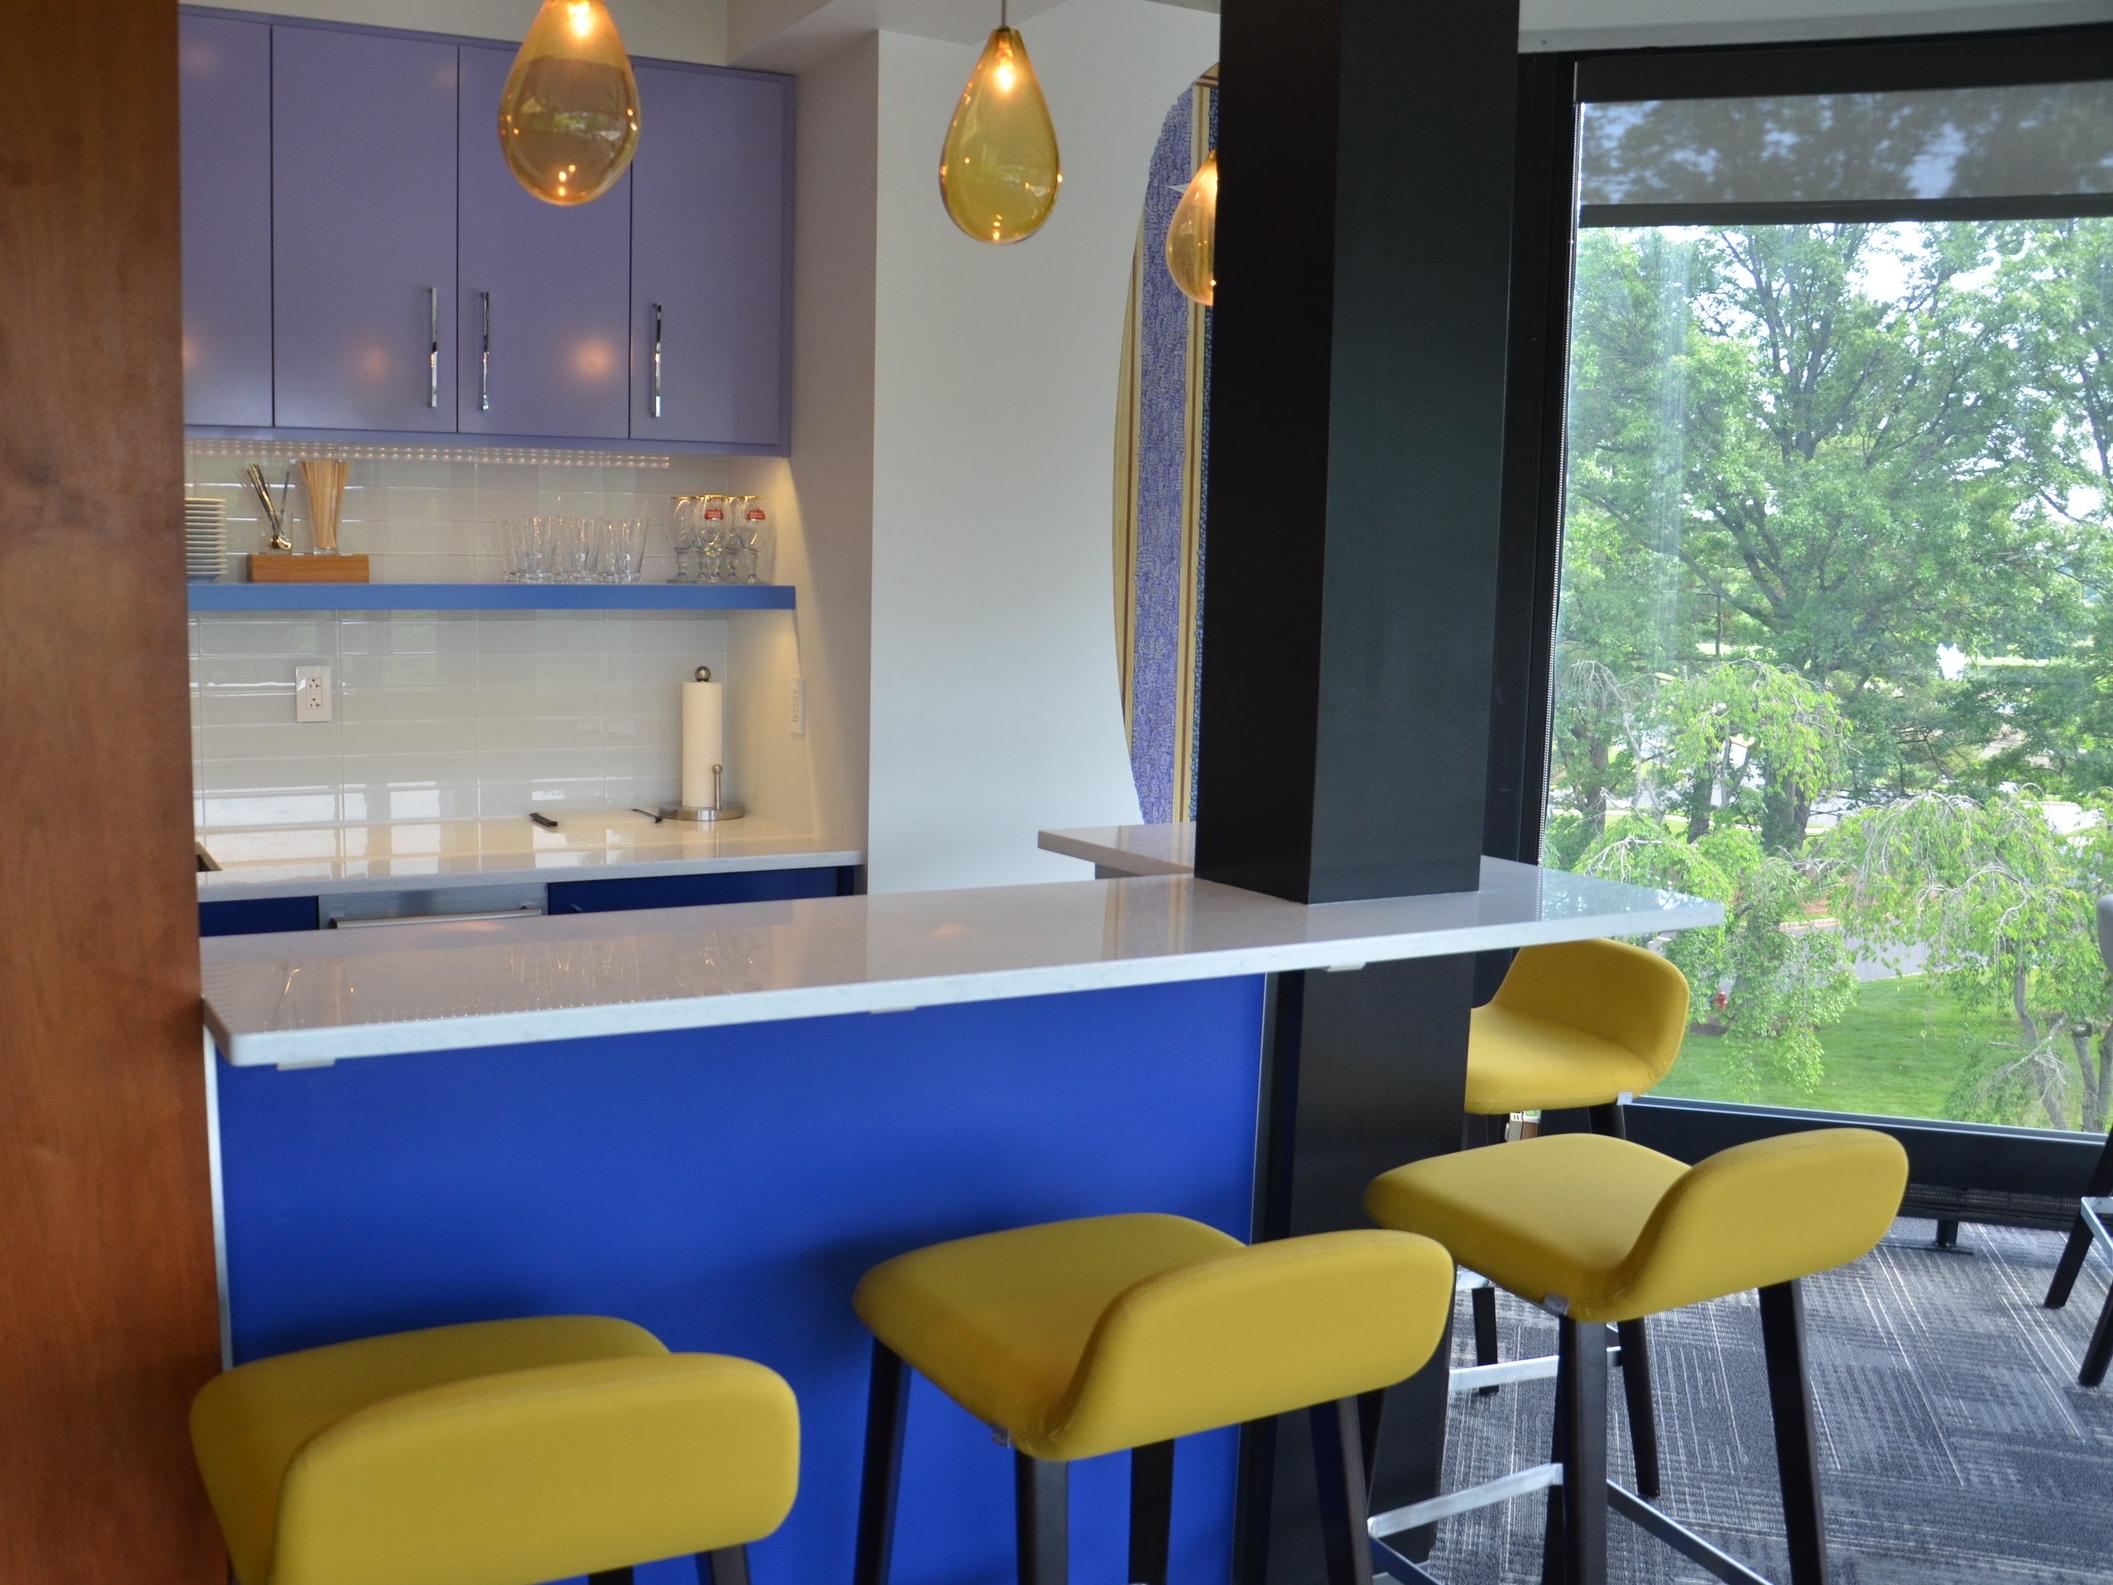 facility-design-corporate-cafe-commercial-office-design-interior-design-firm.jpg